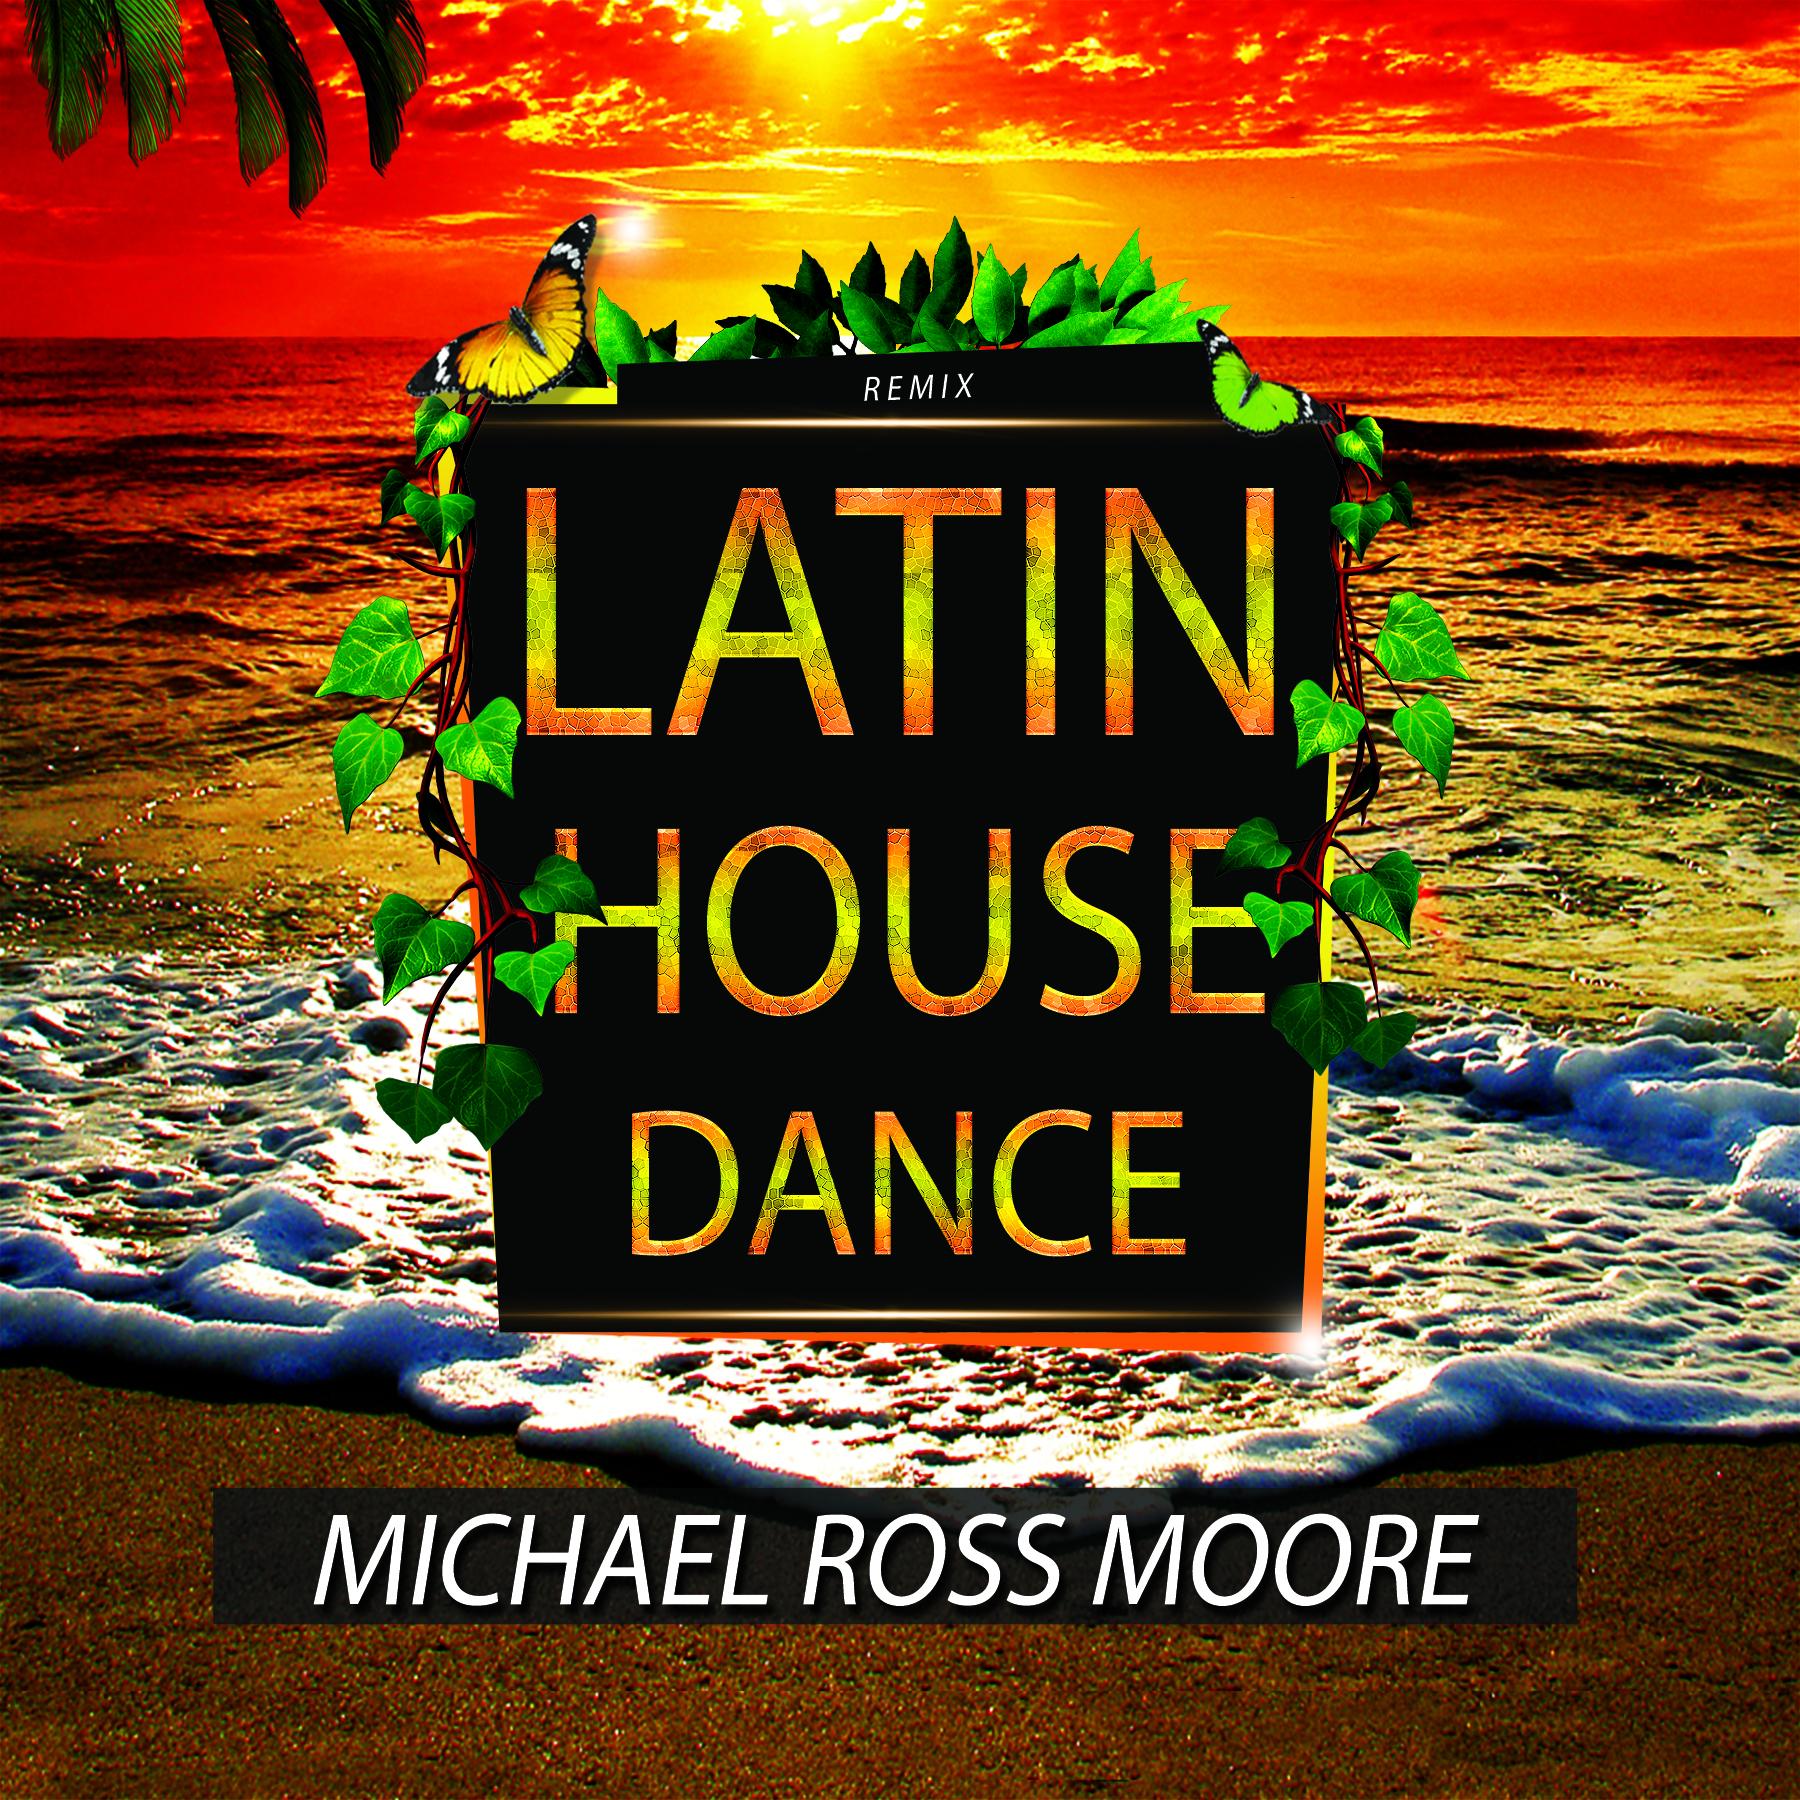 Caratula - Remix Latin-House-Dance